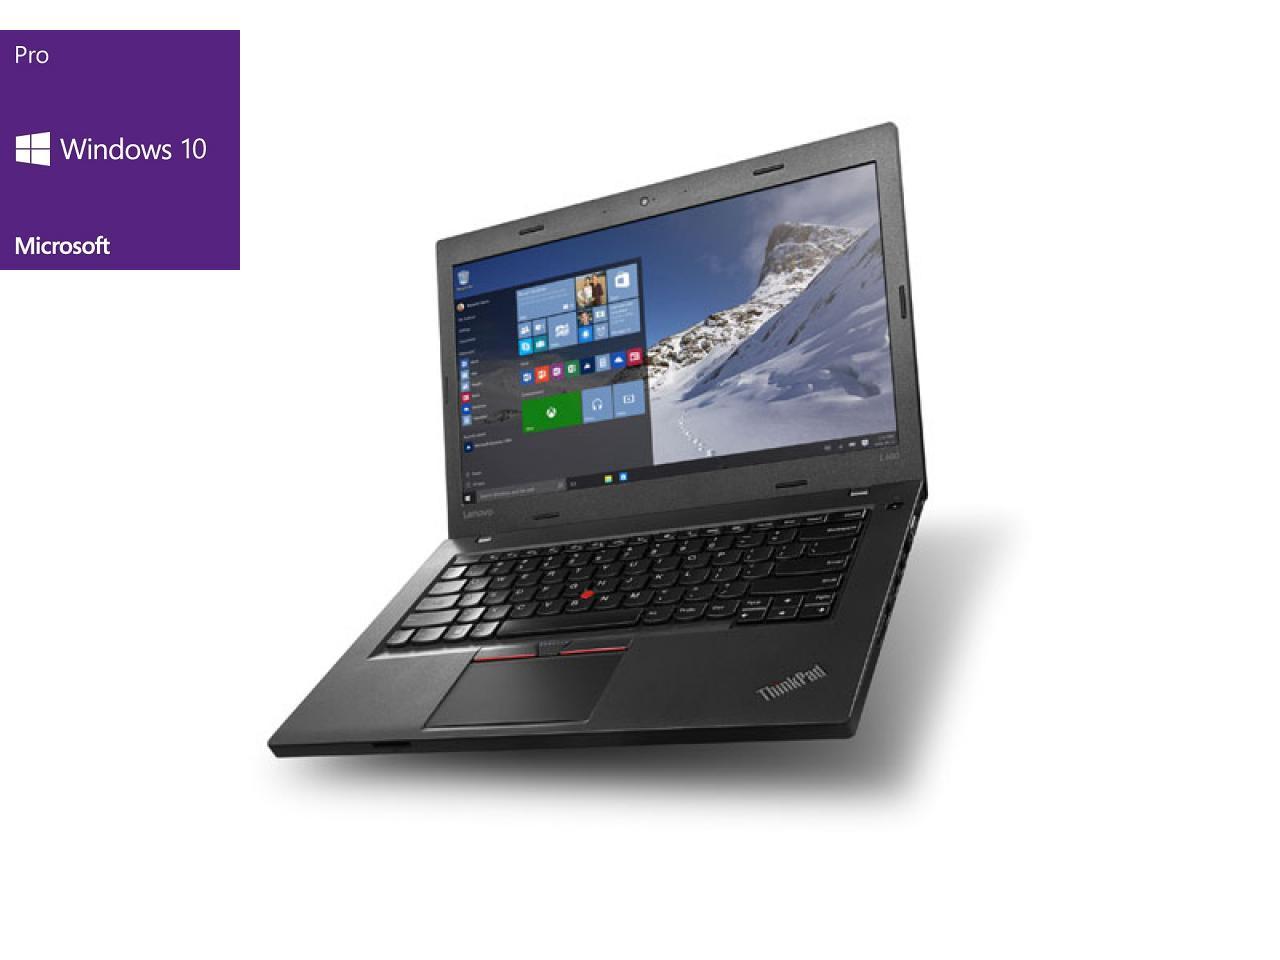 Lenovo ThinkPad L460  - shop.bb-net.de